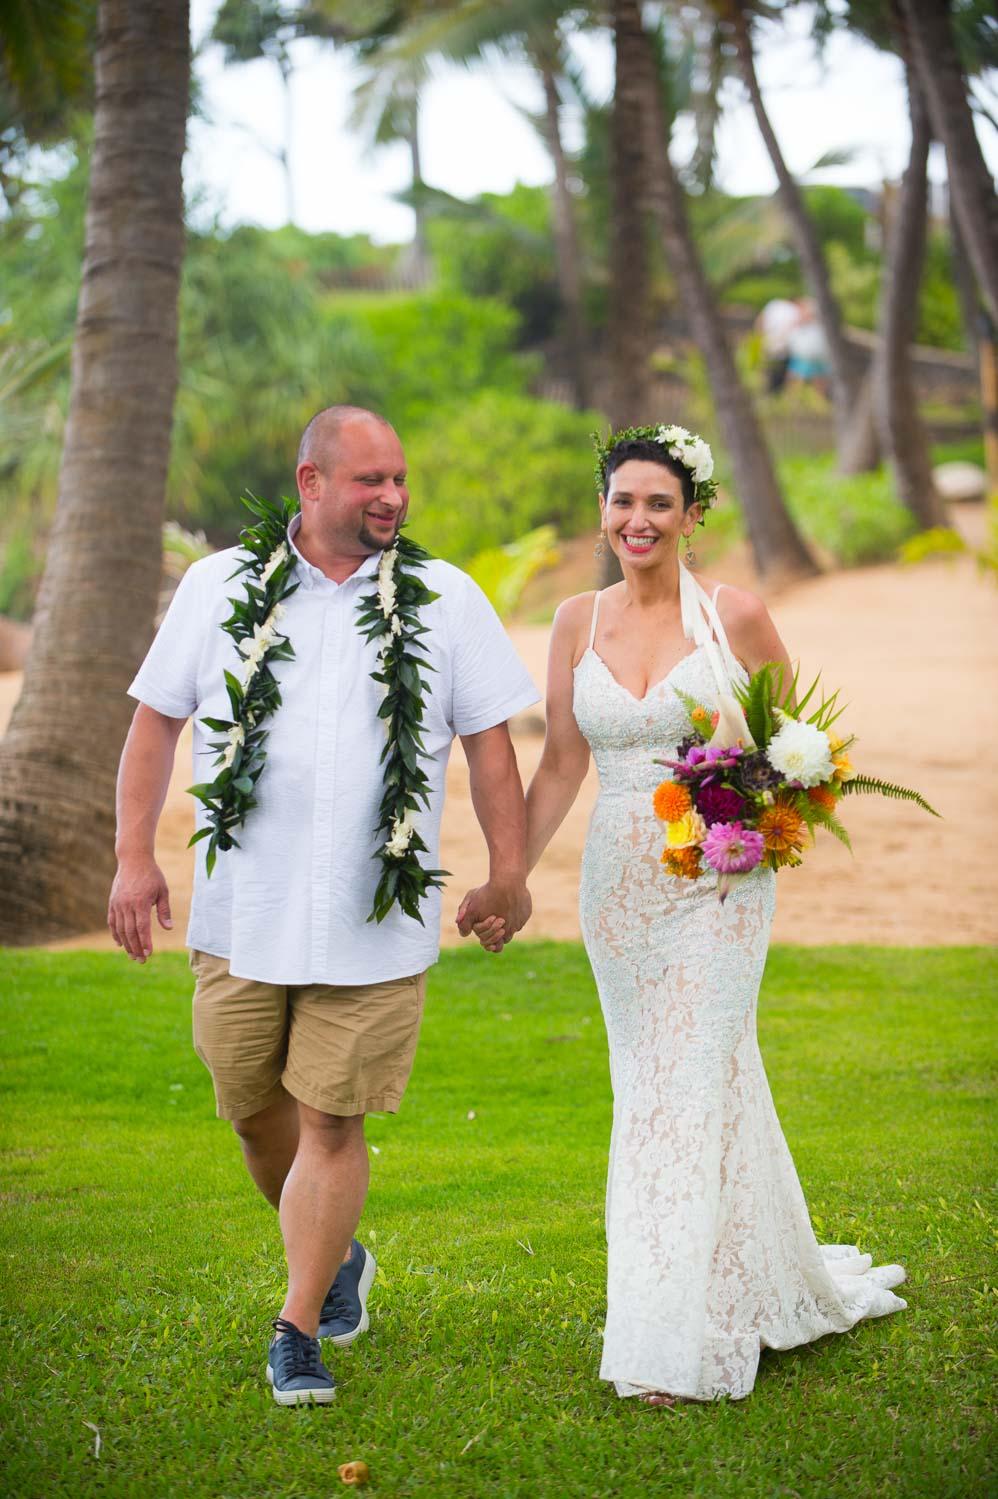 maui-wedding-photography-maui-wedding-venue-Tad-Craig-Photography-47.jpg